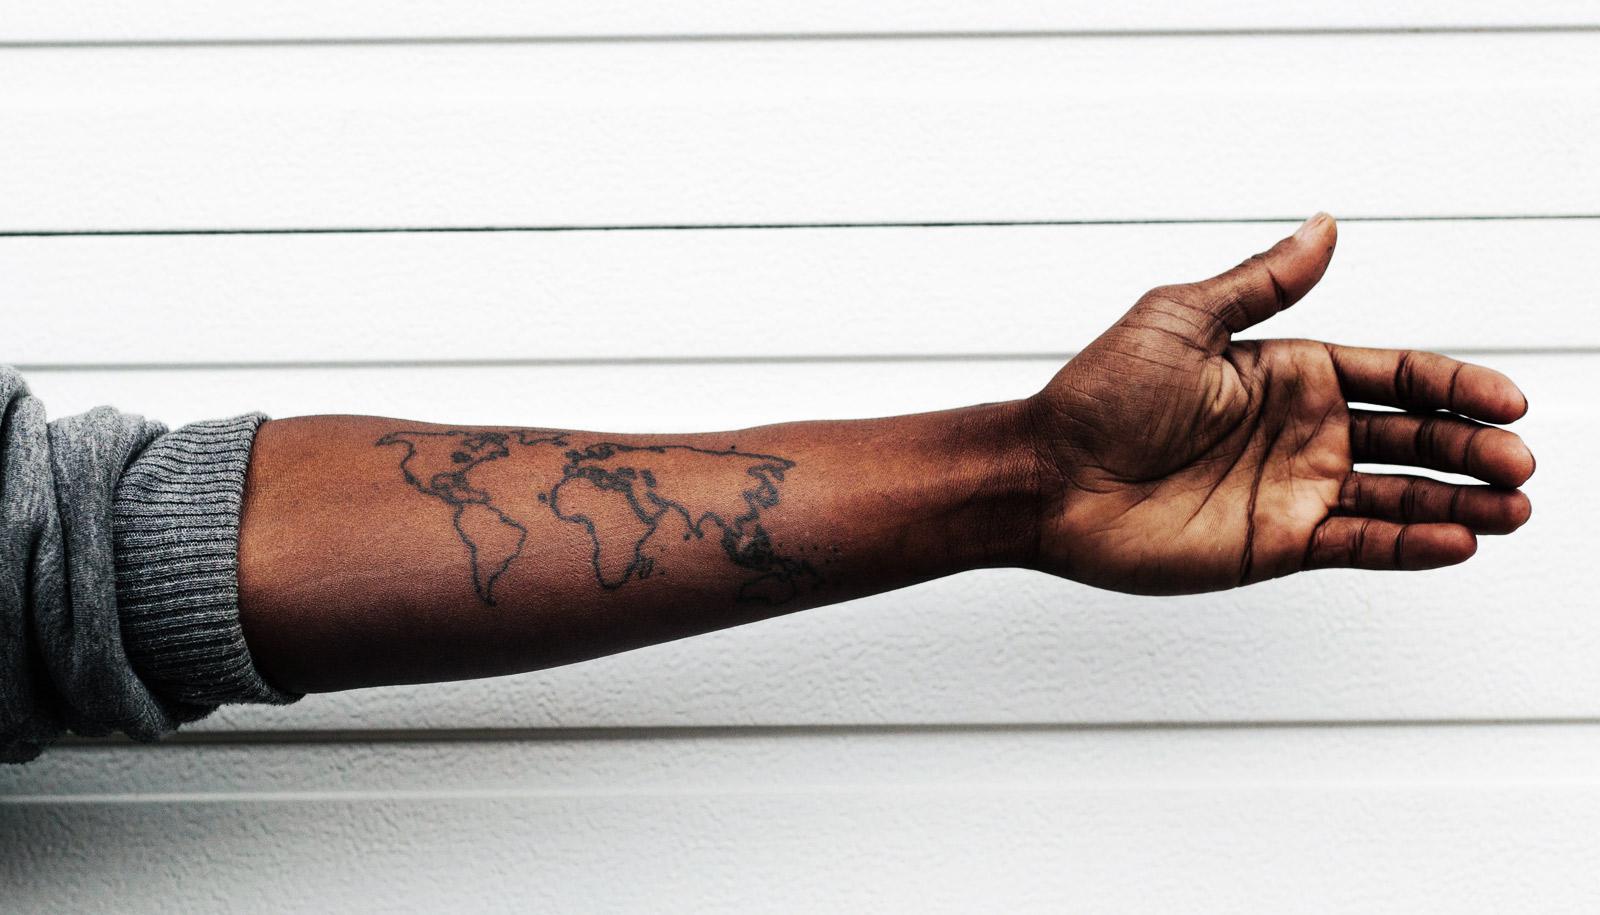 world map tattoo on arm - TIL maps